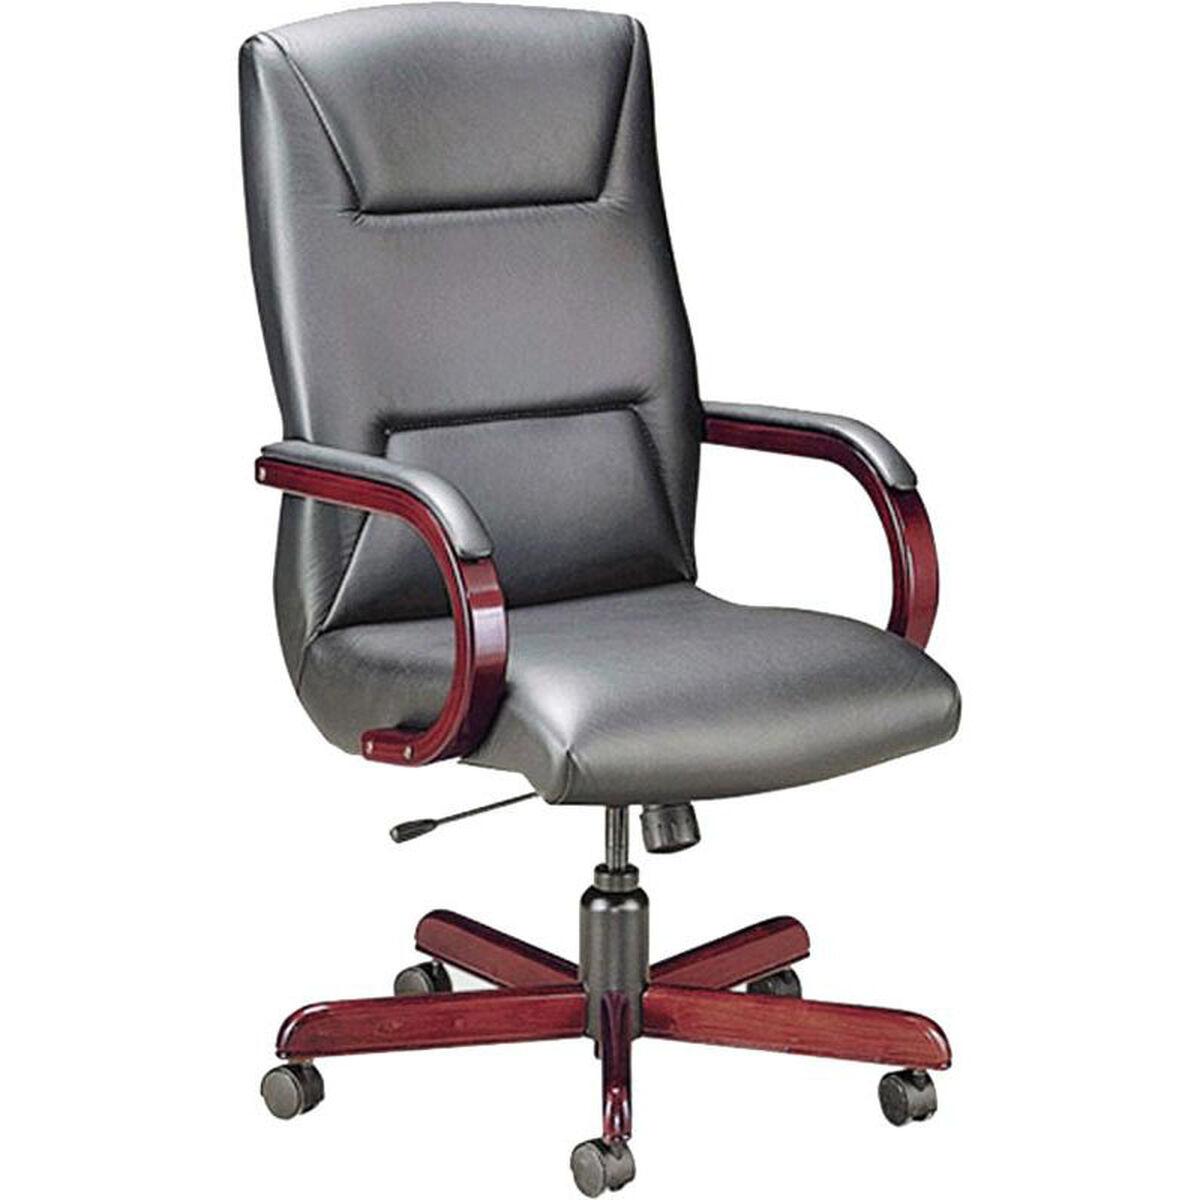 High Point Furniture Industries 1271 Hpf 1271